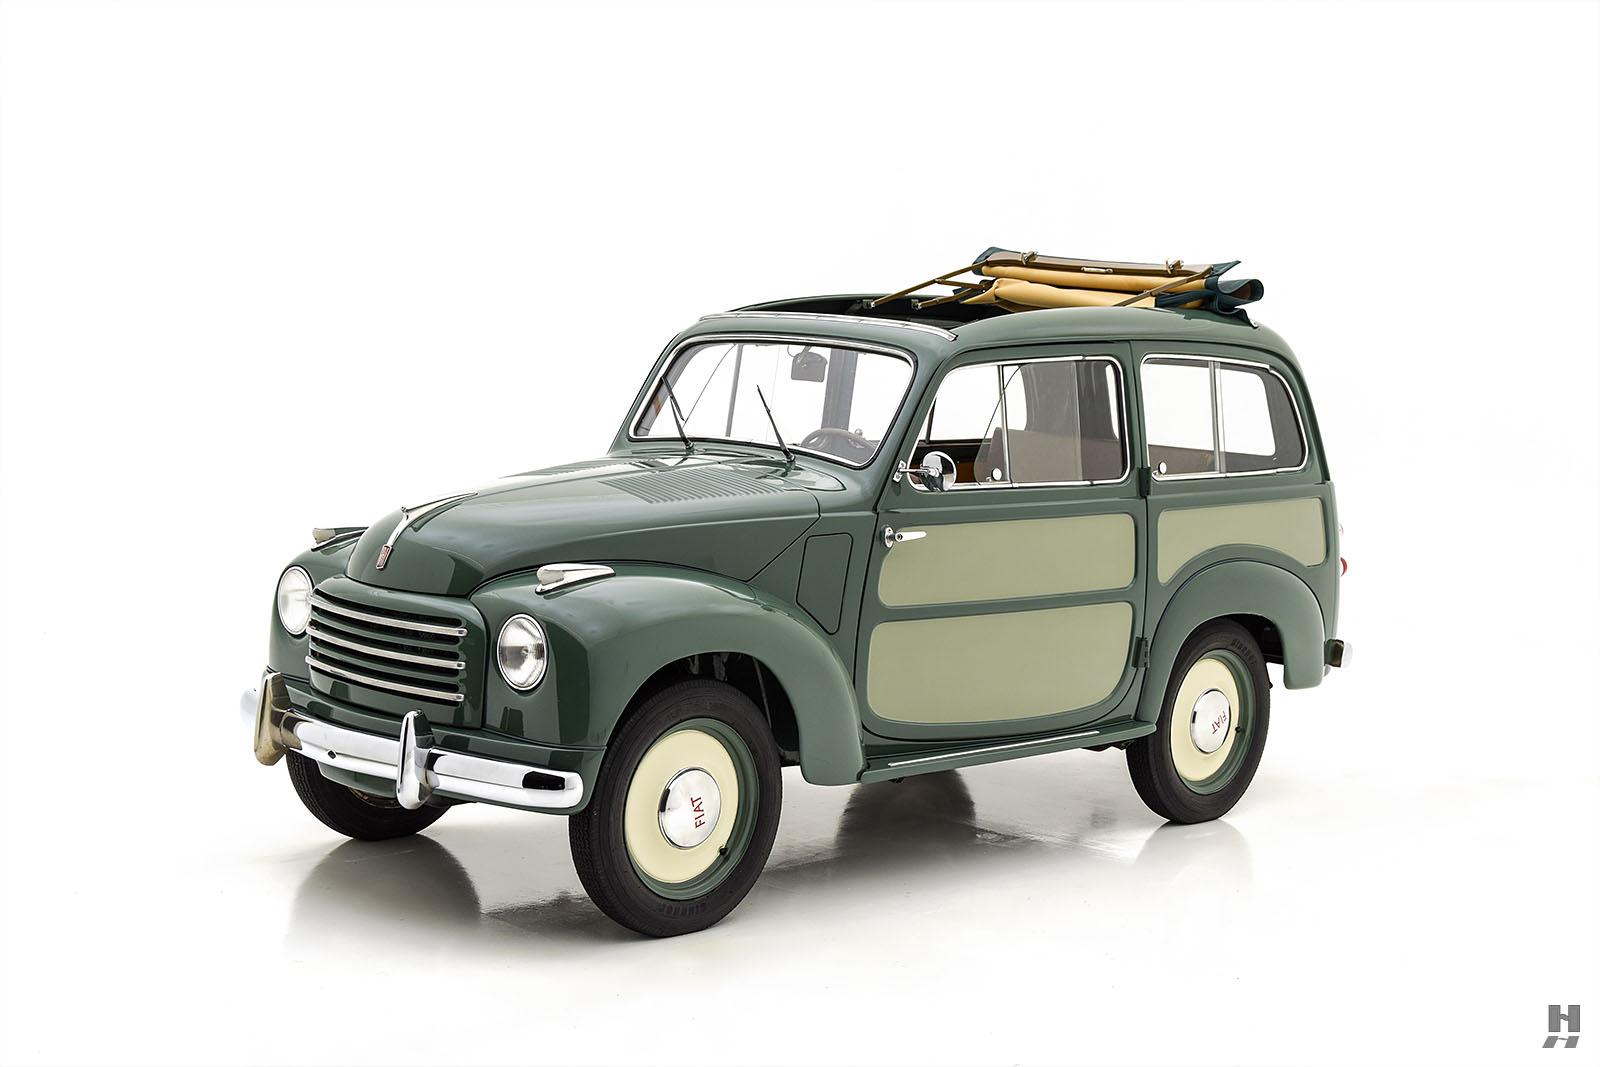 1954 Fiat 500c For Sale at Hyman LTD